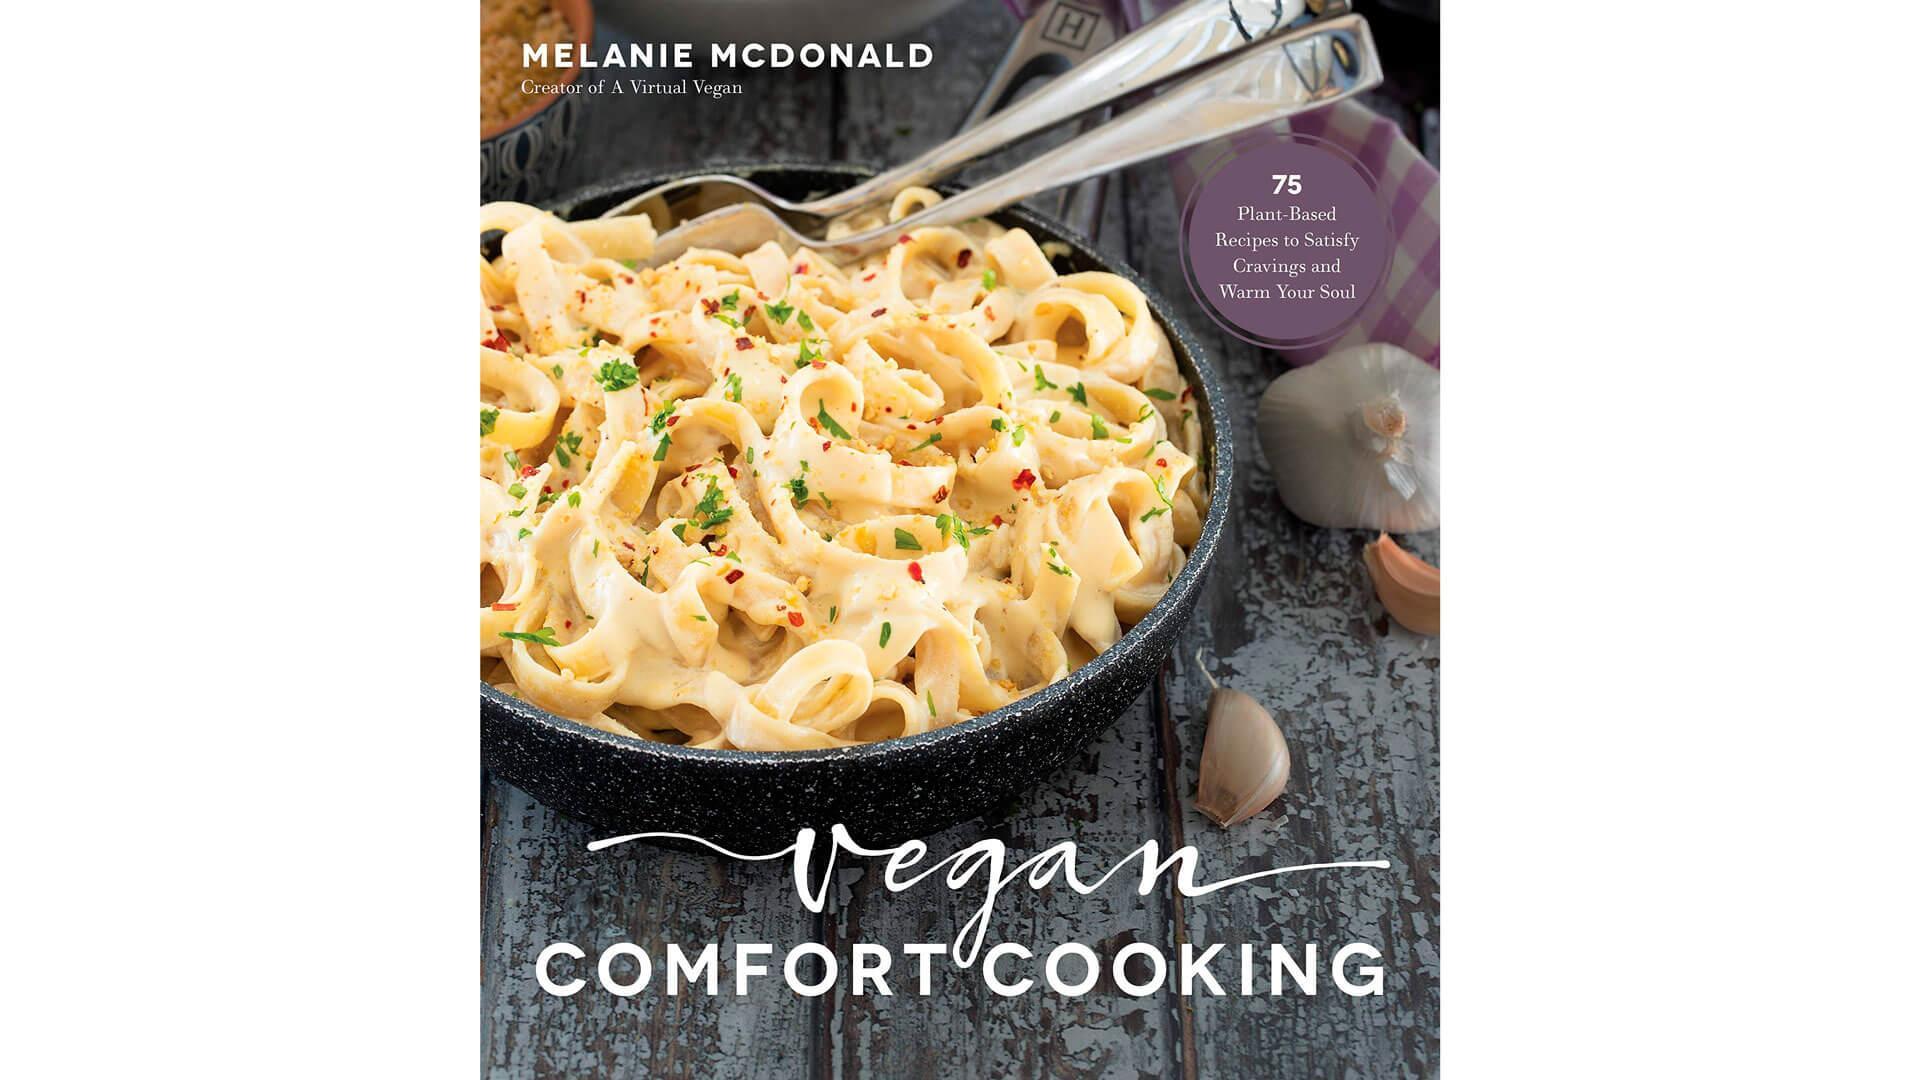 Vegan Cookbook: Vegan Comfort Cooking